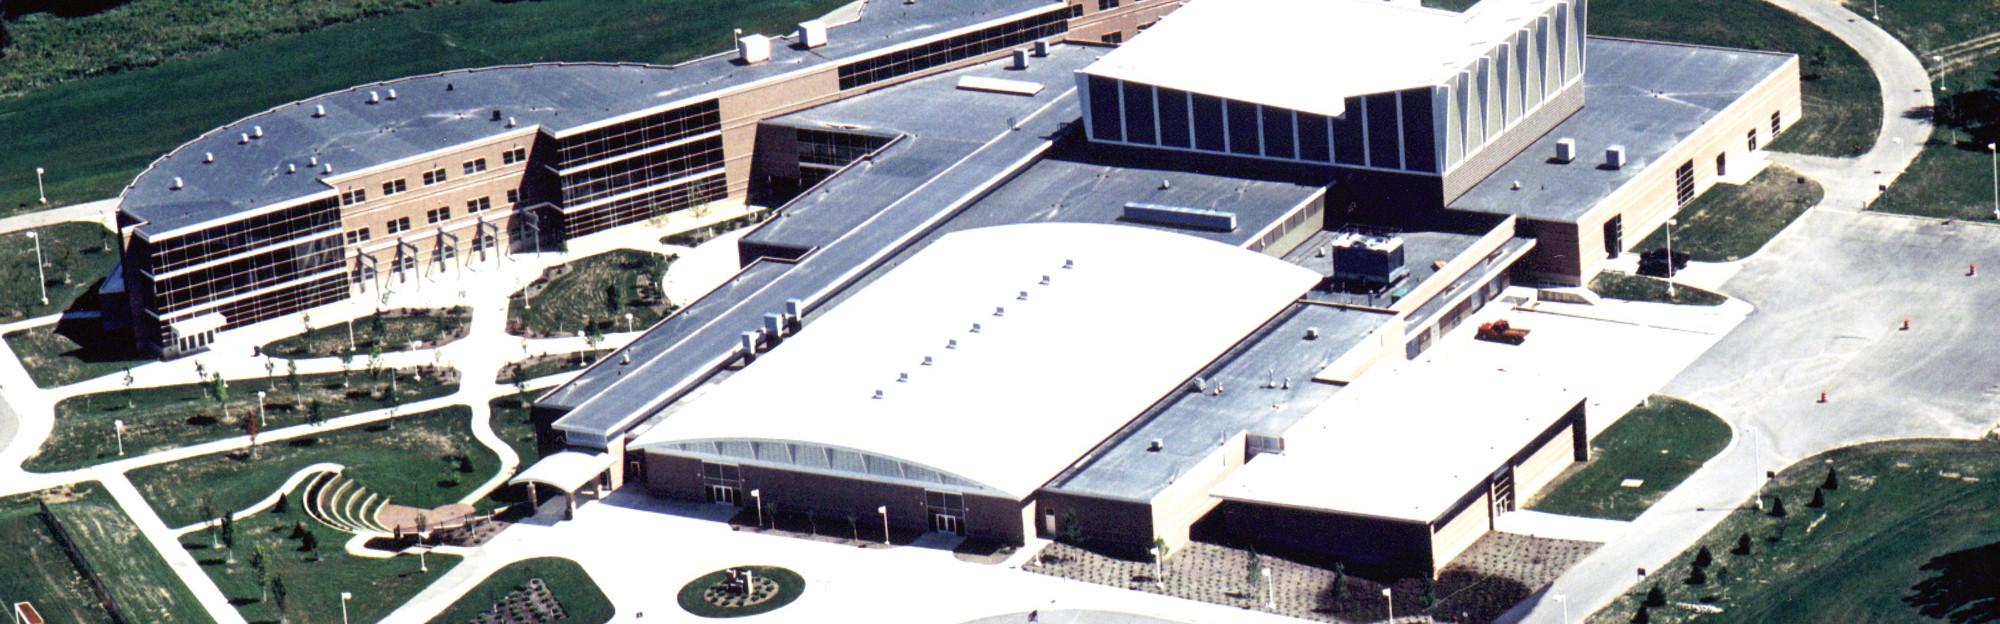 NorthviewHighSchool-Public-USA-Michigan-Schoolview